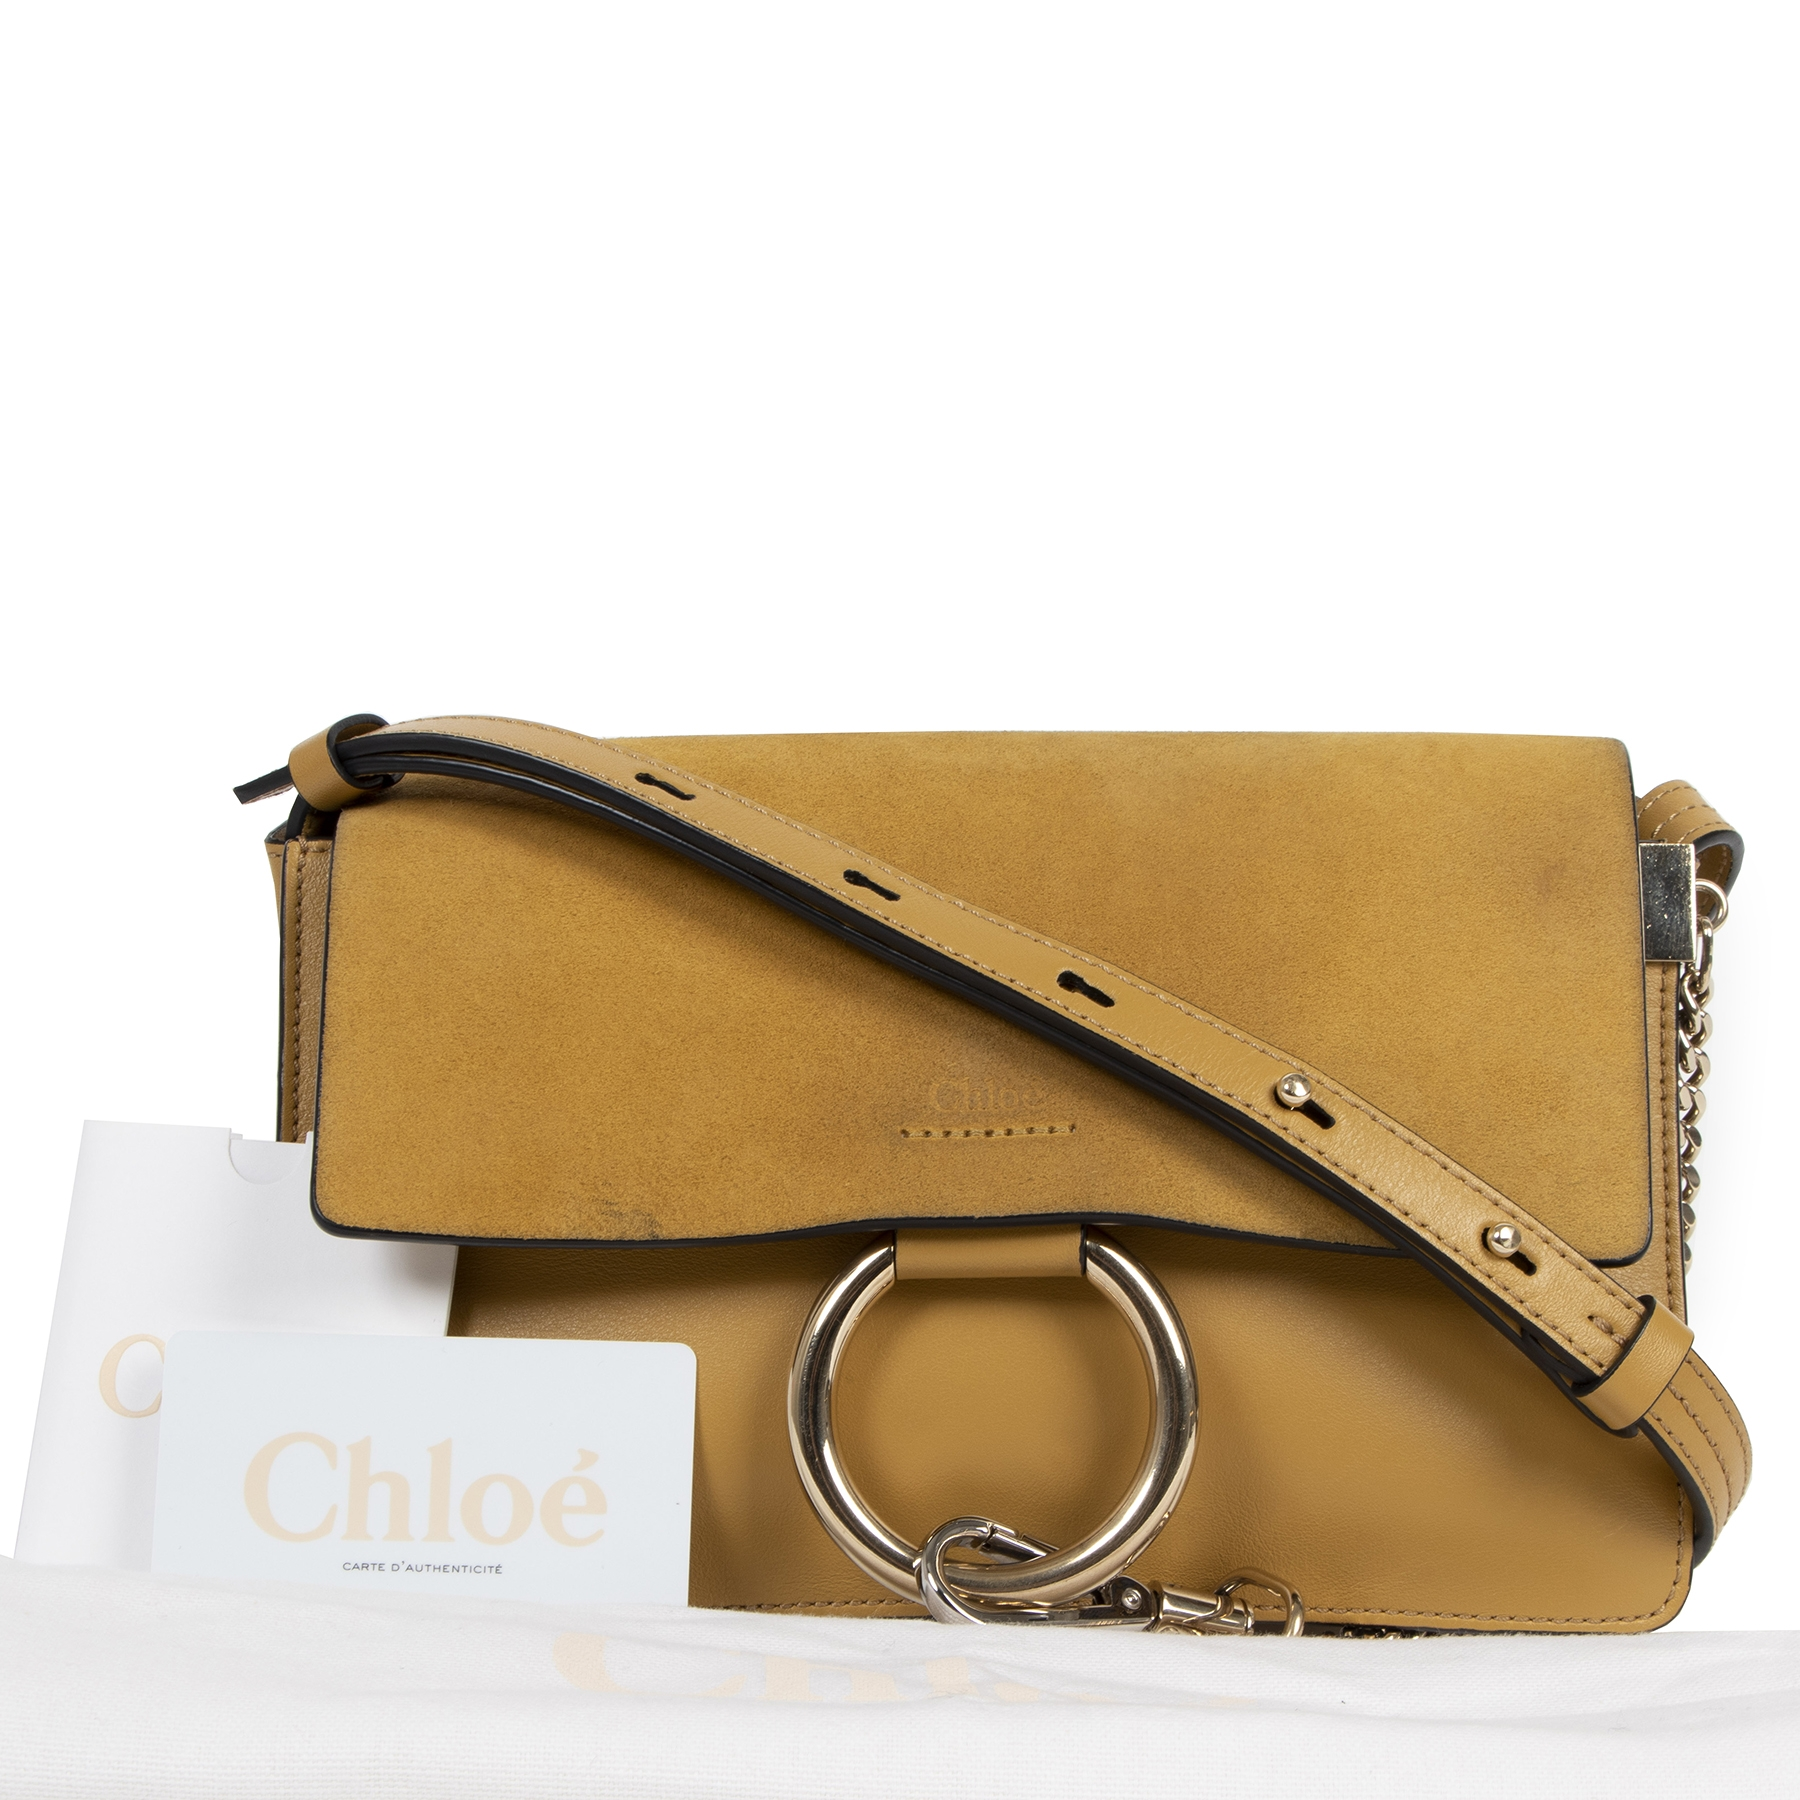 Authentic secondhand Chloé Faye Suede Leather Small Shoulder Bag designer bags fashion luxury vintage webshop designer brands online shopping